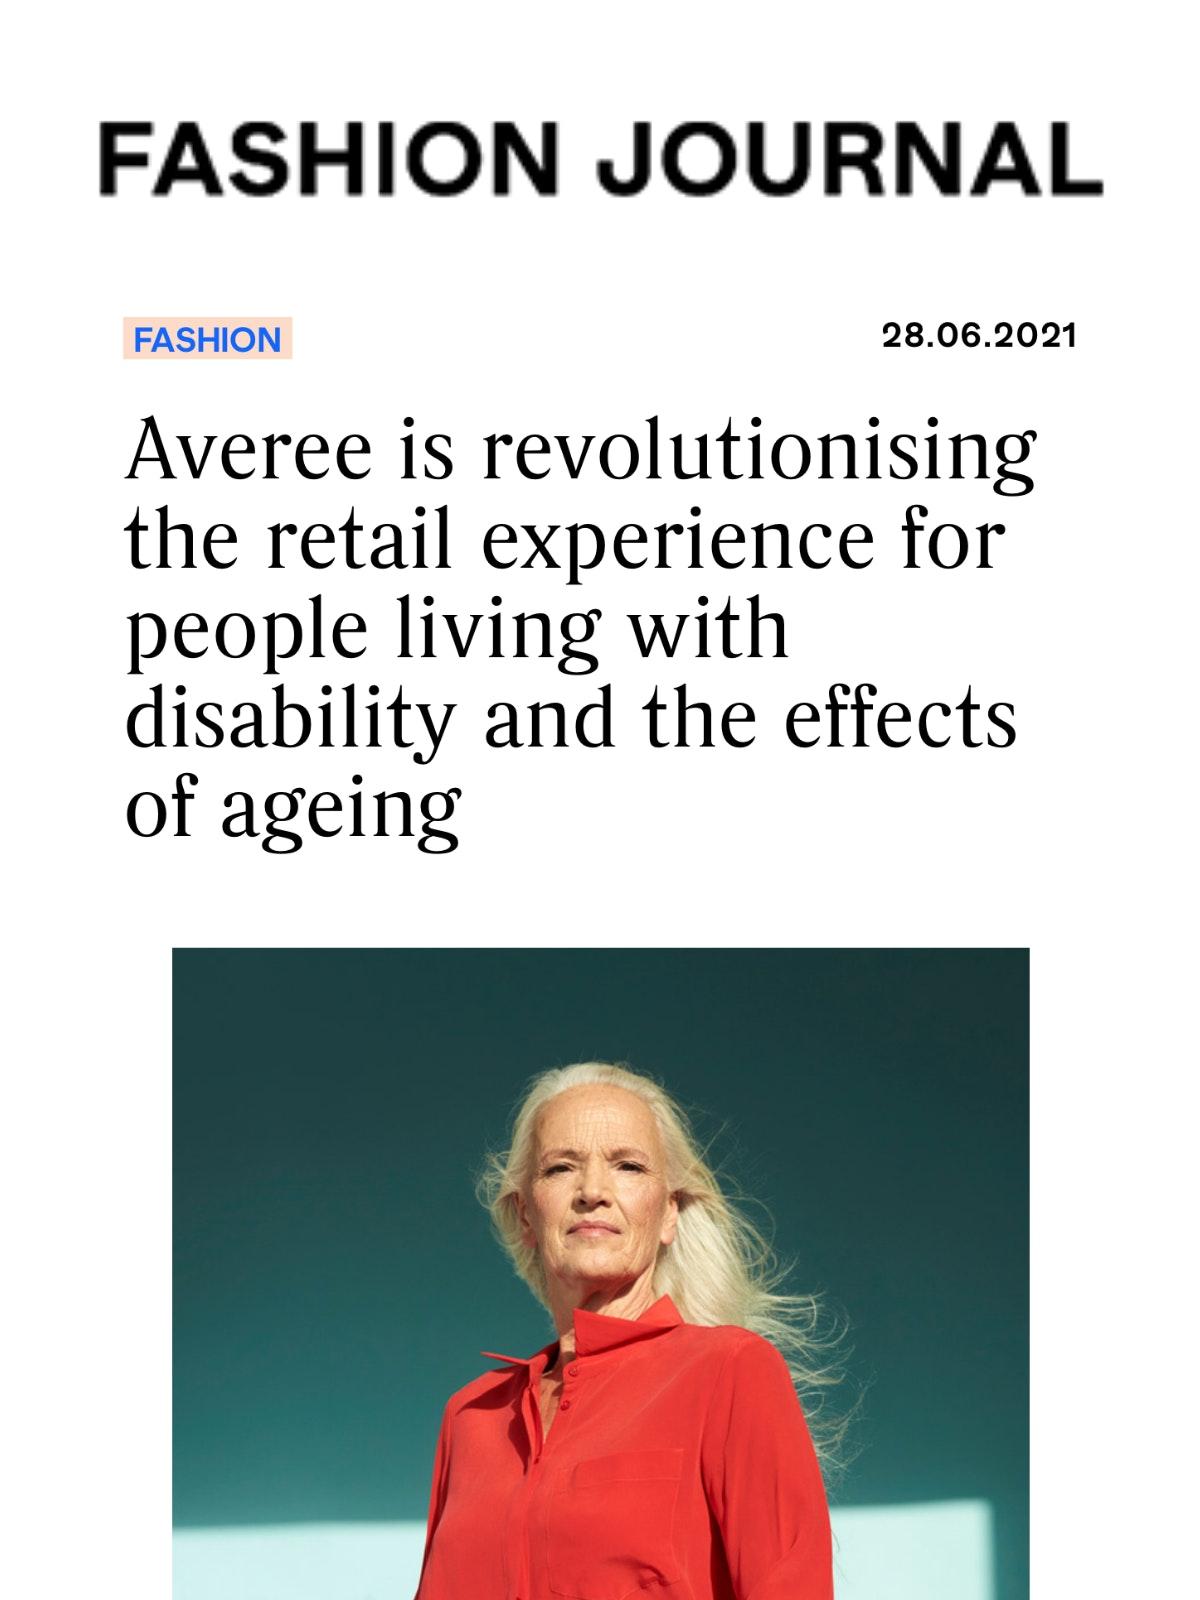 A screenshot of the Fashion Journal article